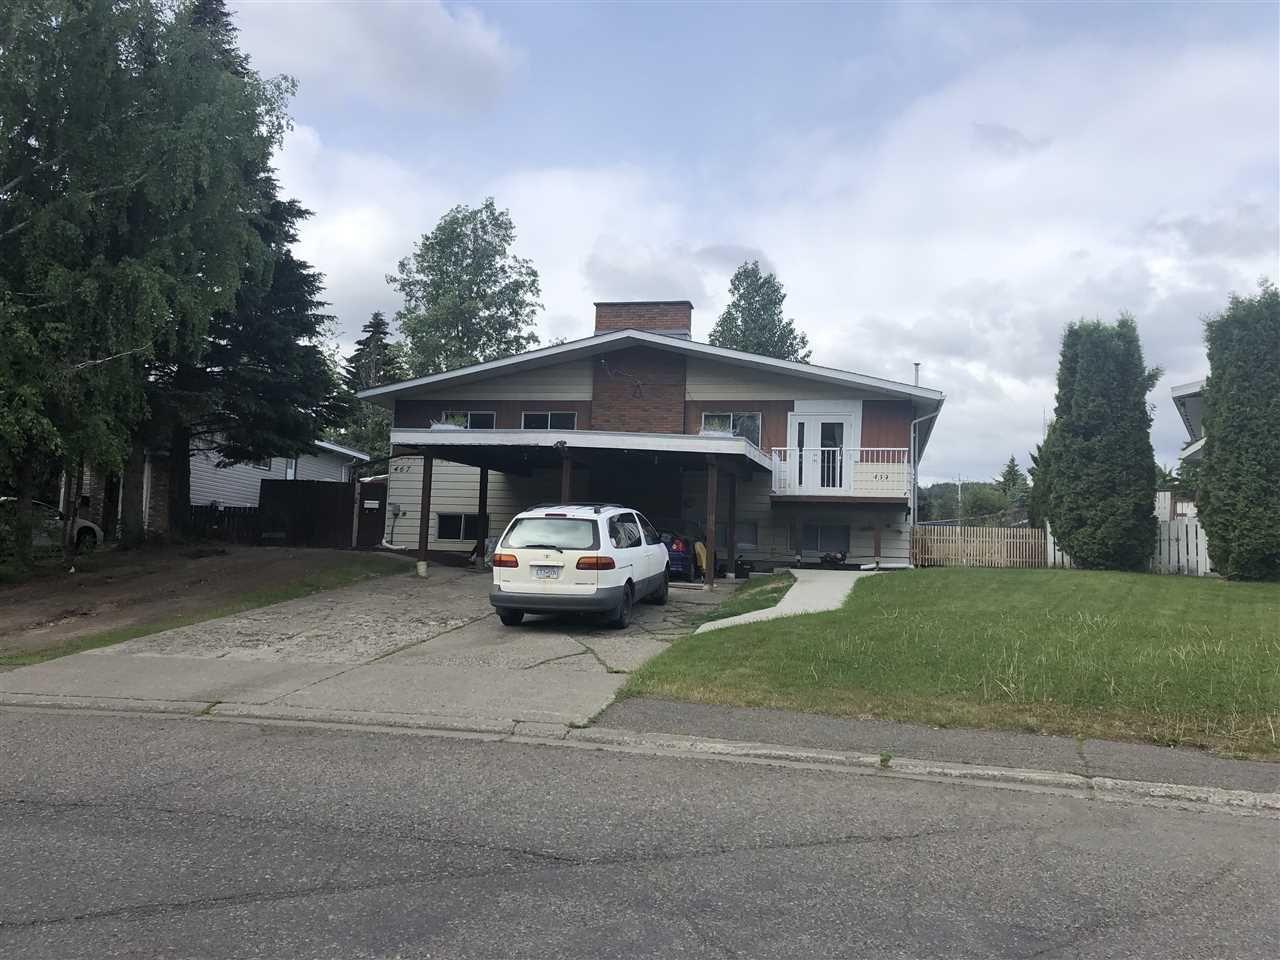 Main Photo: 459 - 467 BRIGADE Street in Prince George: Highglen Duplex for sale (PG City West (Zone 71))  : MLS®# R2376700